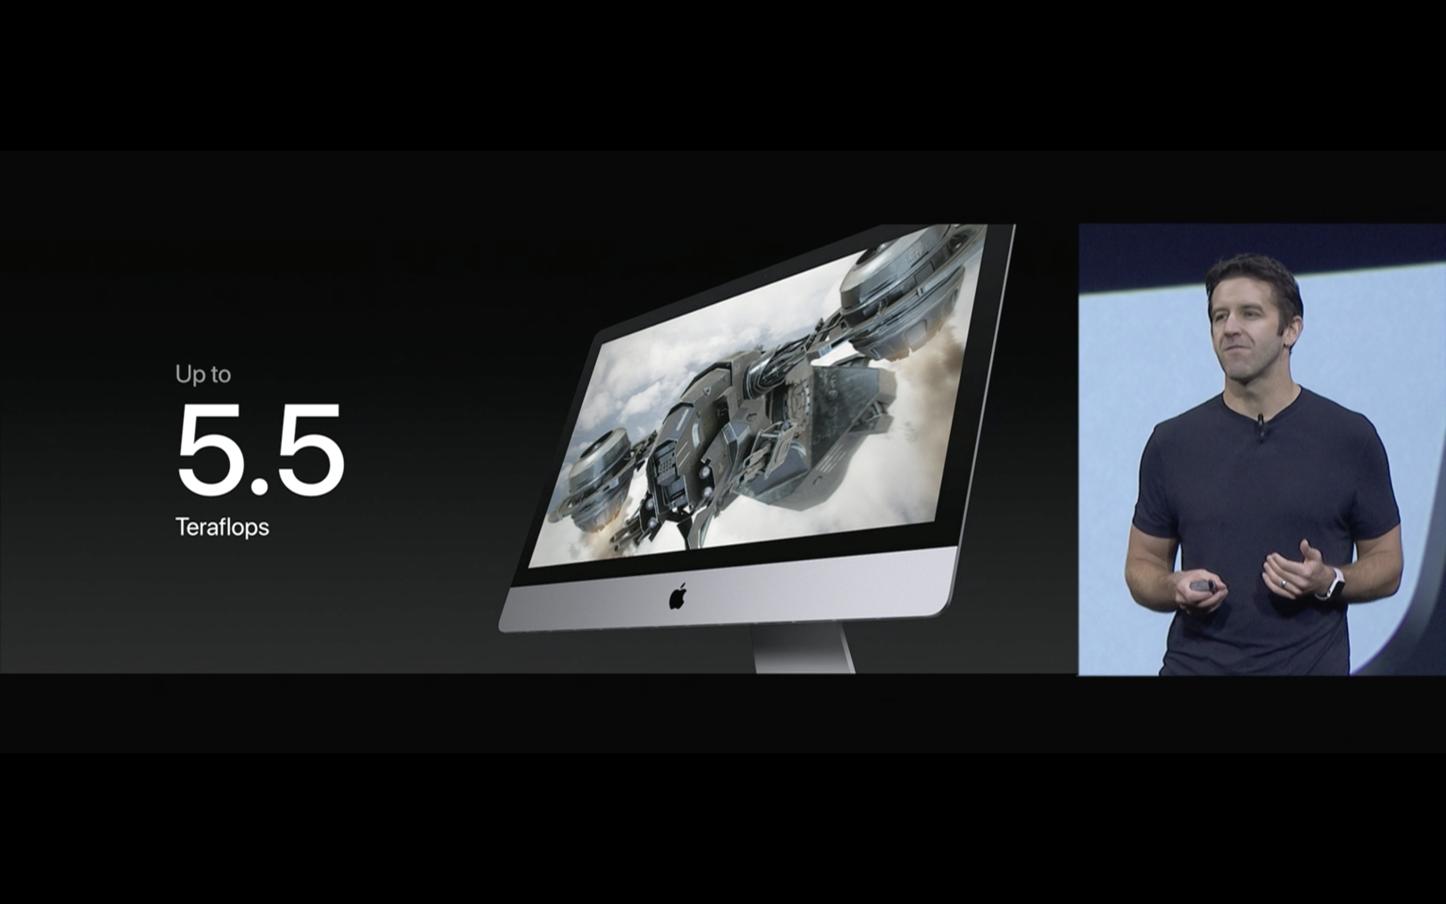 New-iMac-2017-WWDC17-16.png